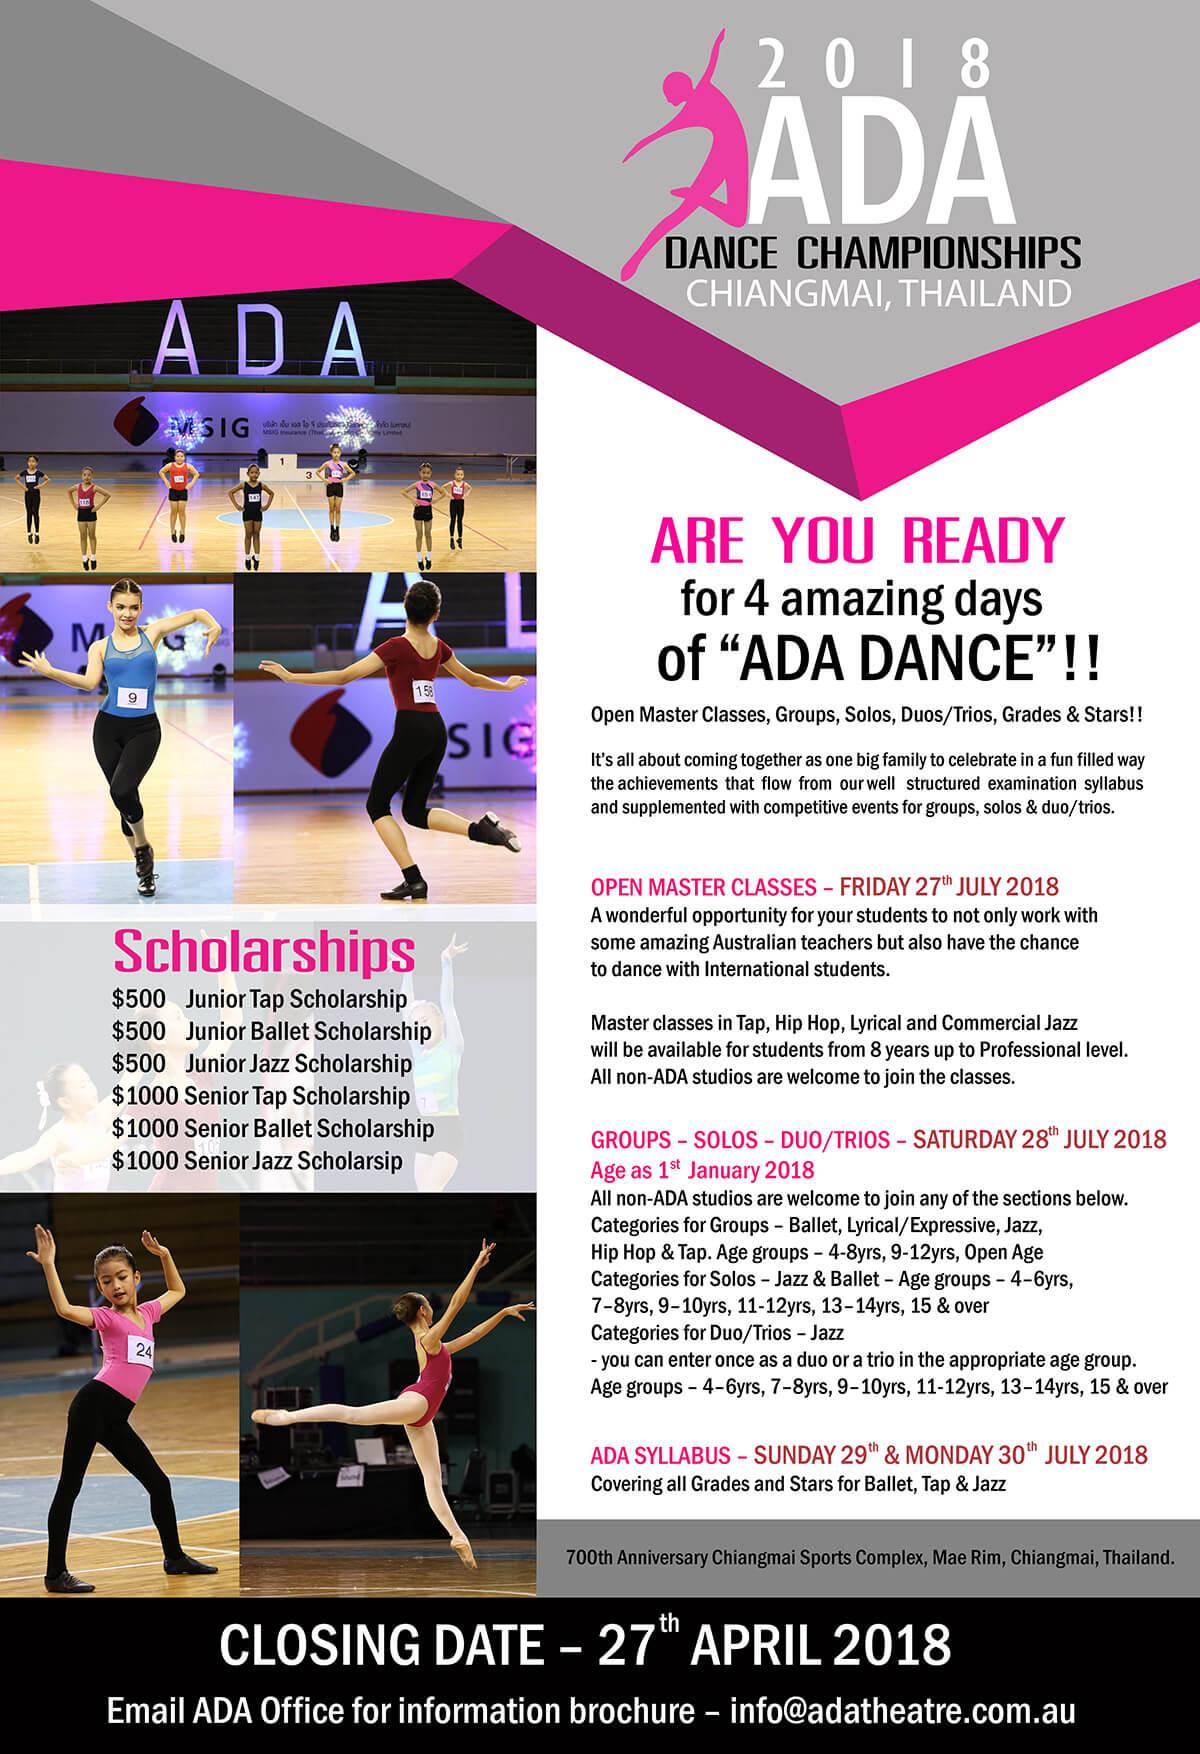 ADA Dance Championships - Thailand